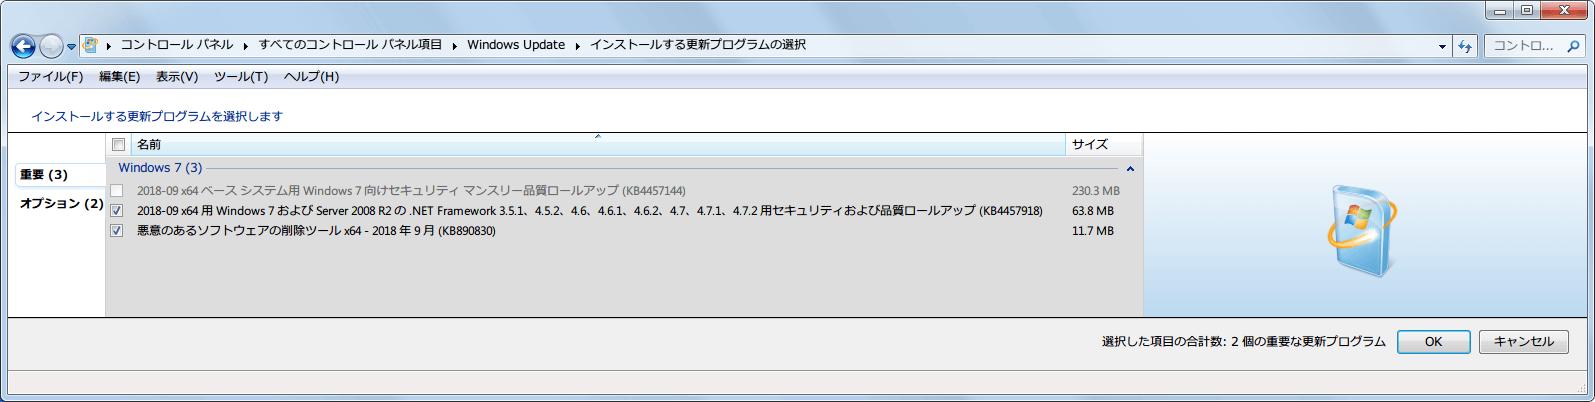 Windows 7 64bit Windows Update 重要 2018年9月分リスト KB4457144 非表示